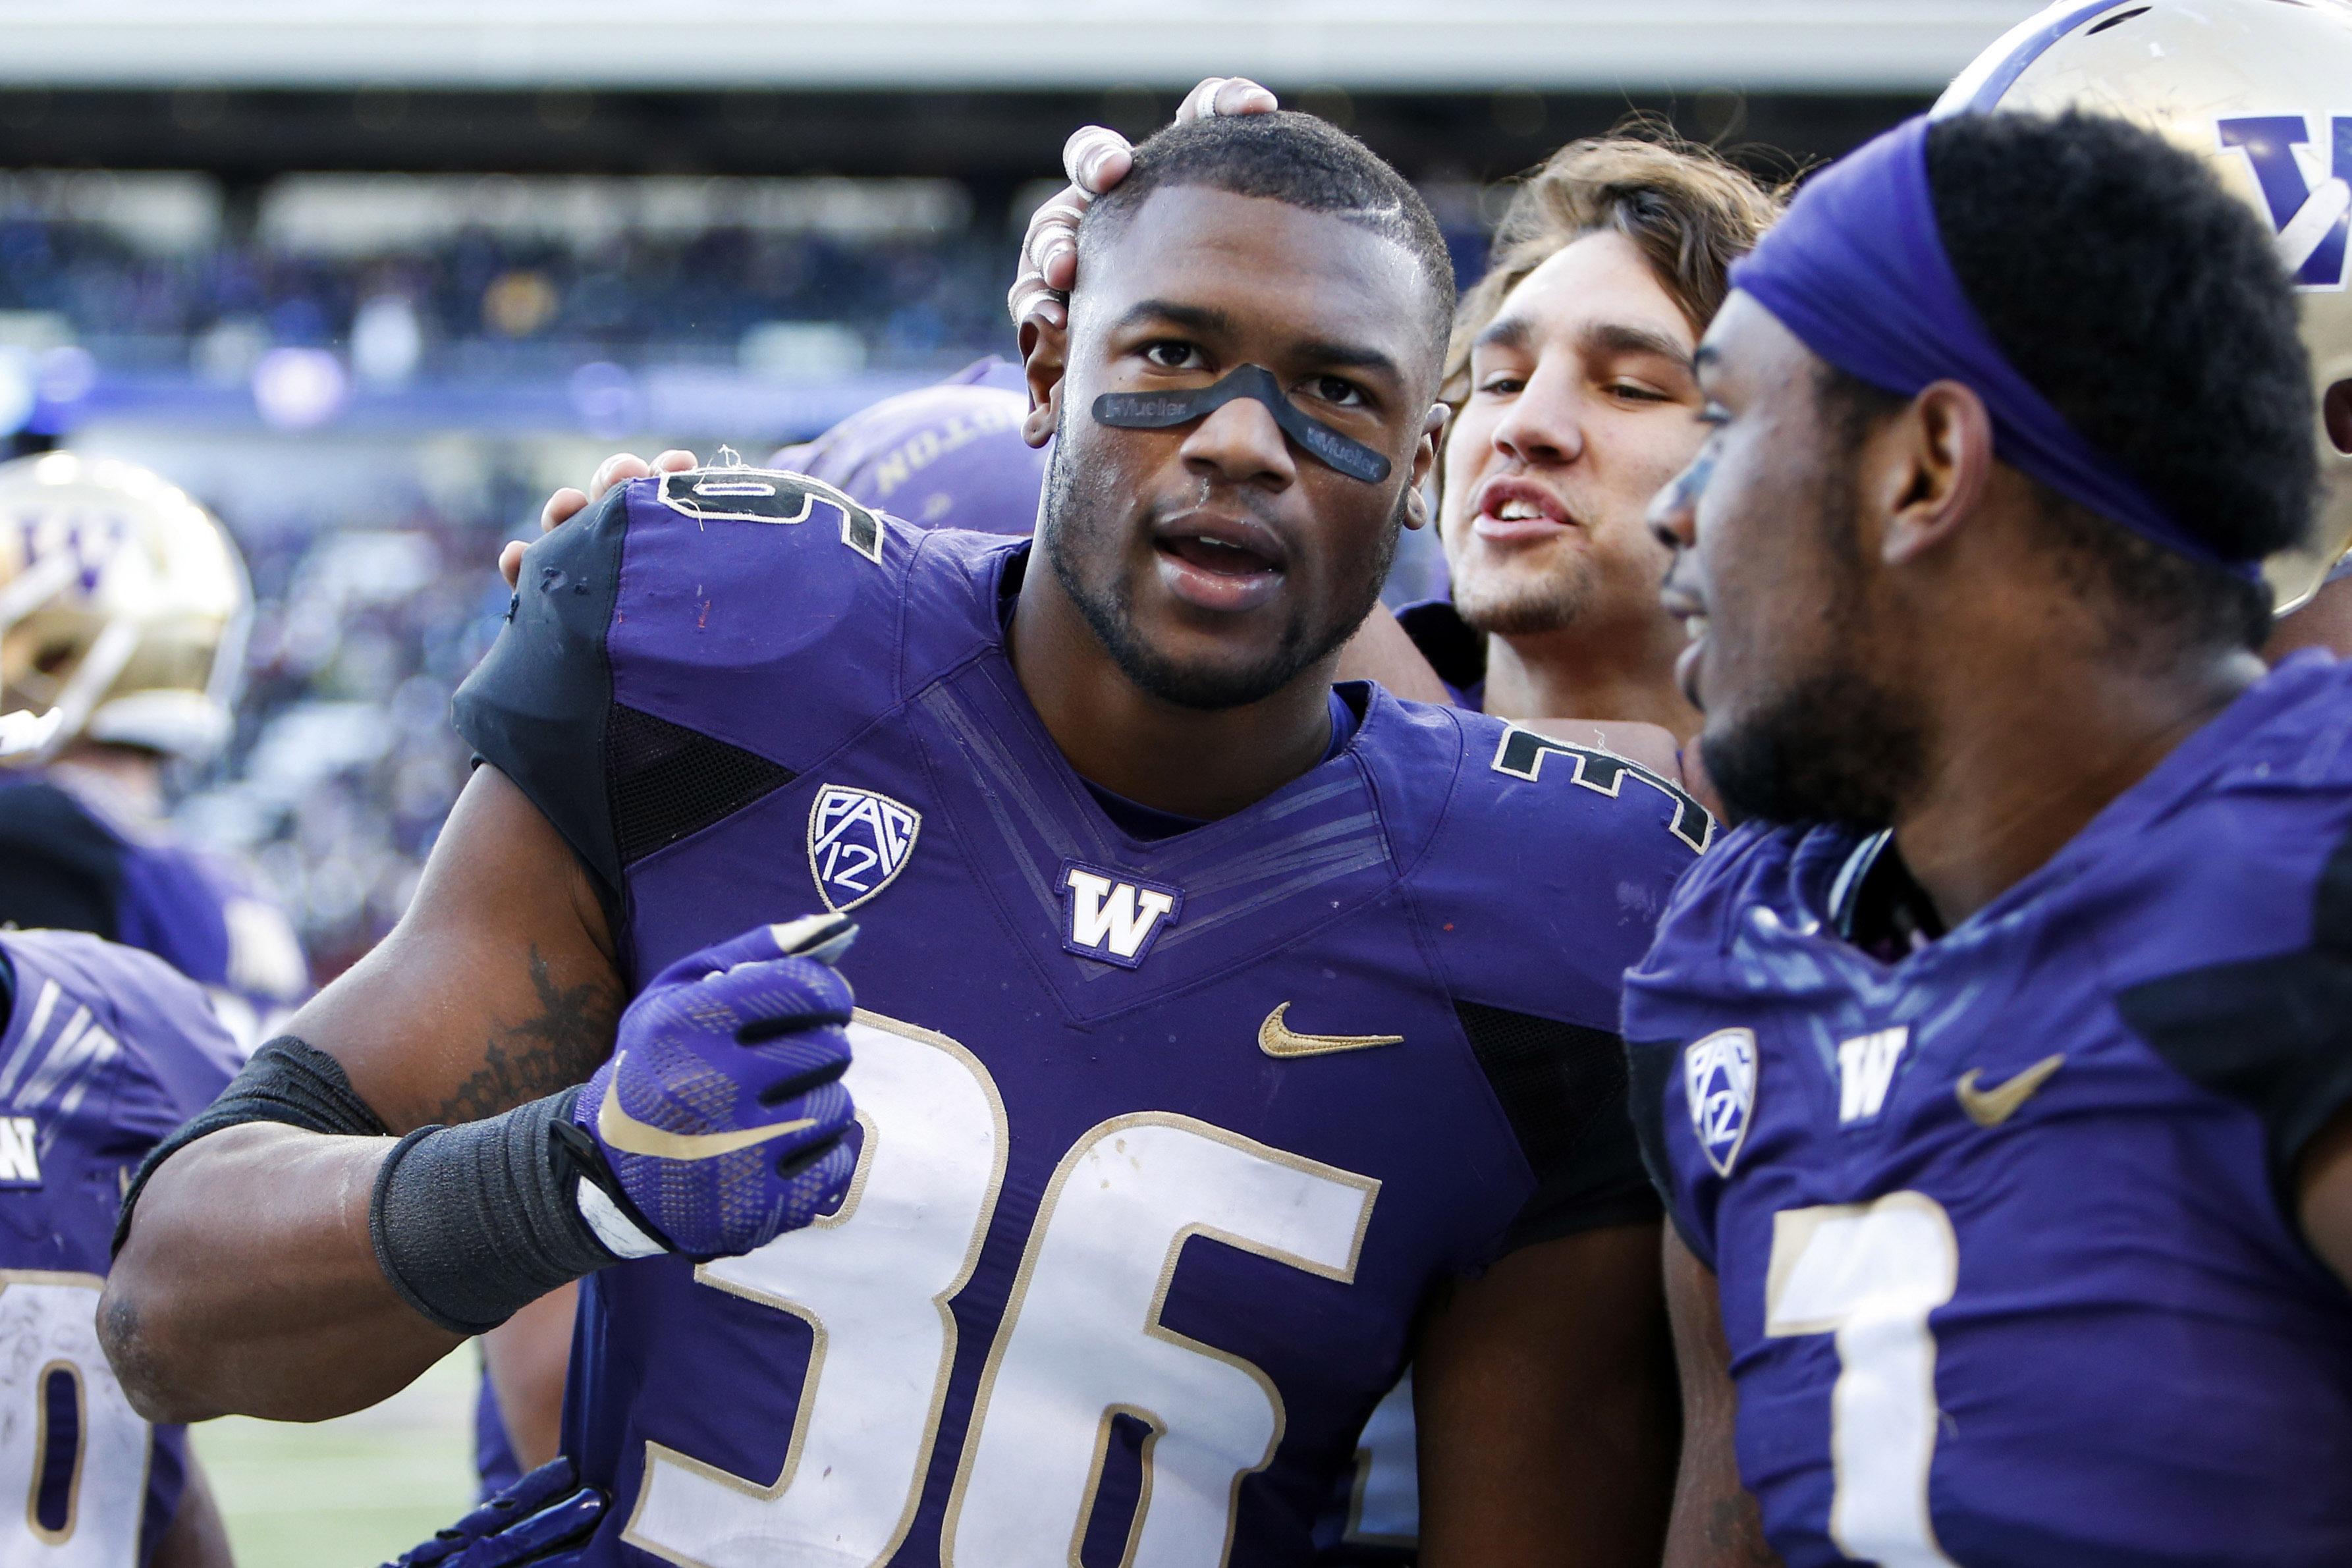 NCAA Football: Washington State at Washington